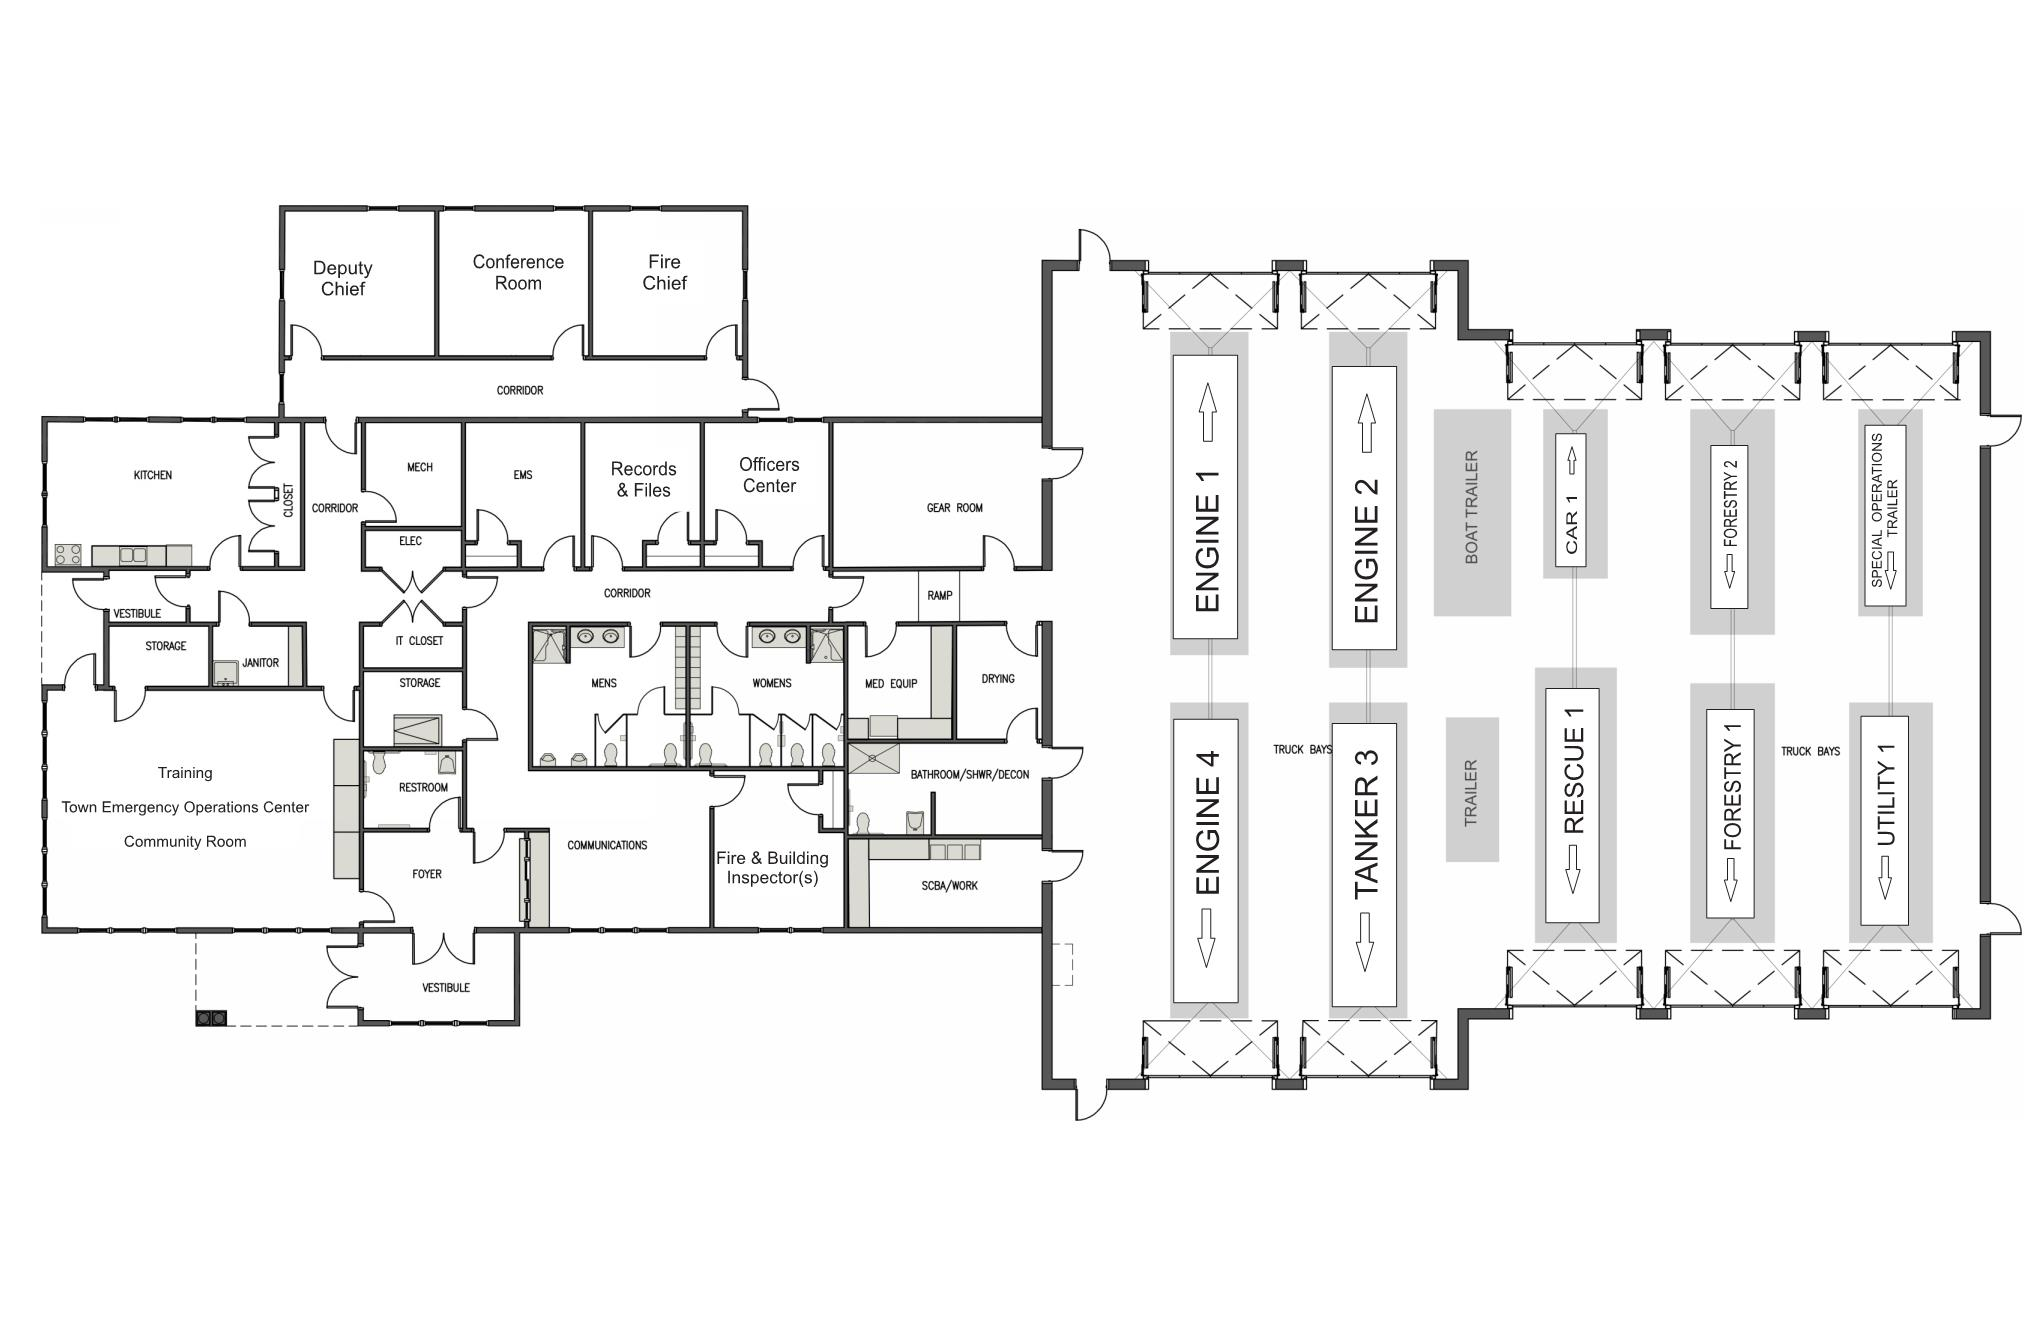 Design Proposed Litchfield Fire Station – Fire Station Floor Plans